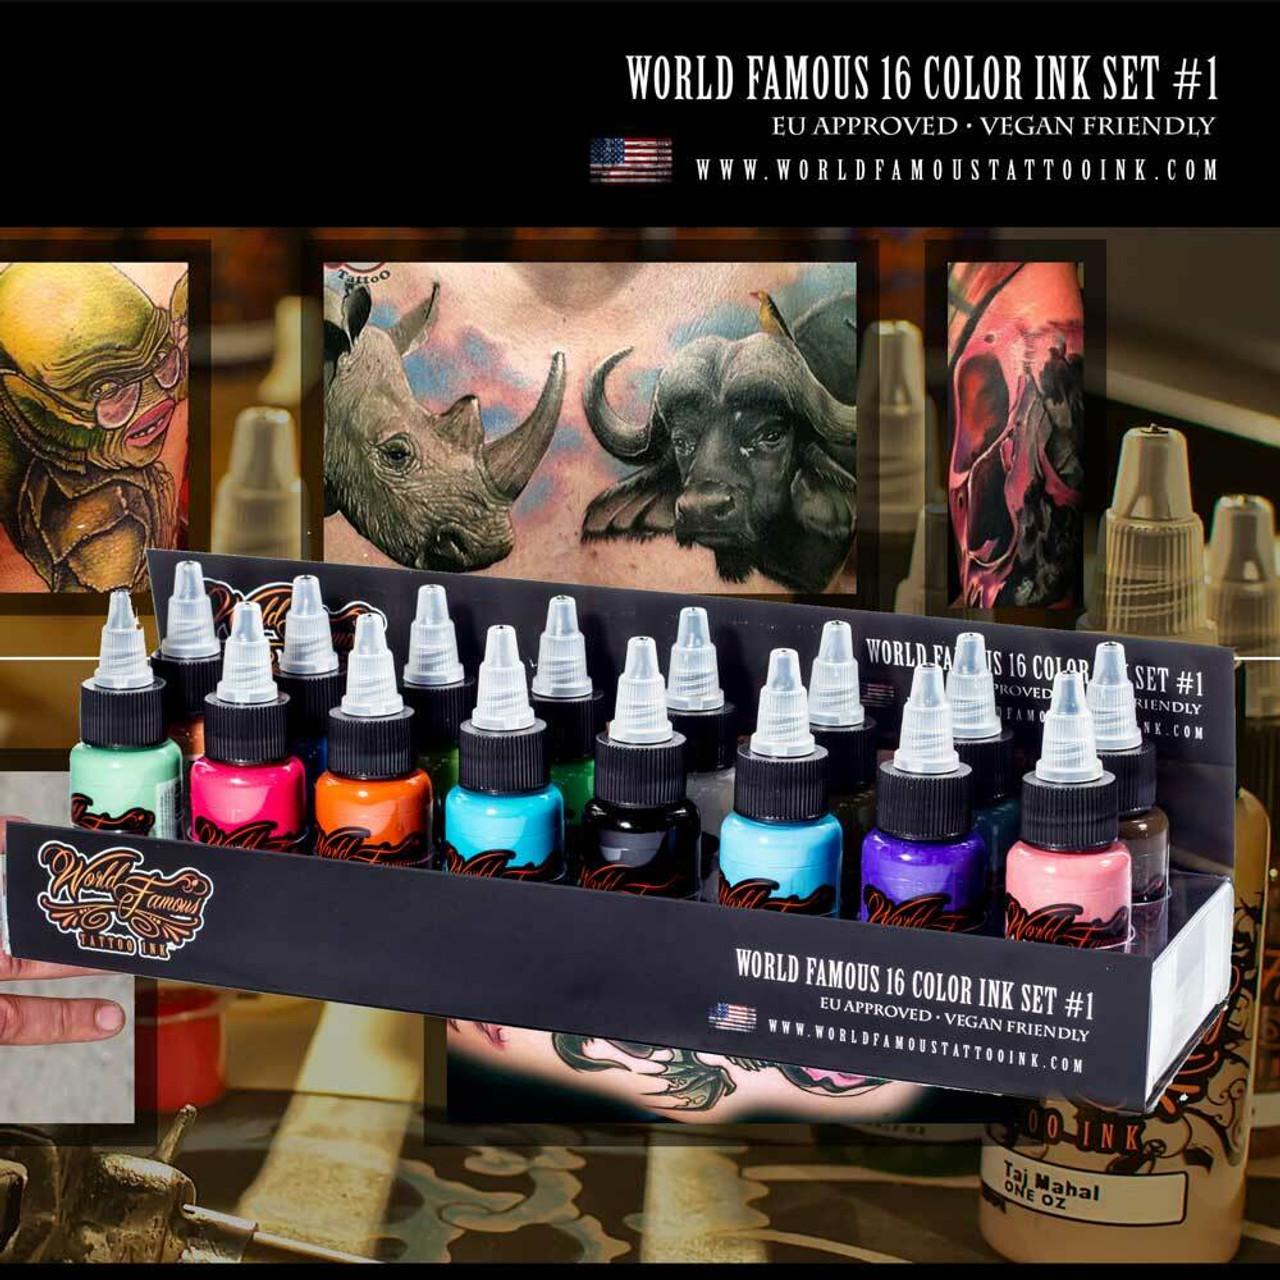 WORLD FAMOUS 16 COLOR INK SET #1 - Electrum Supply